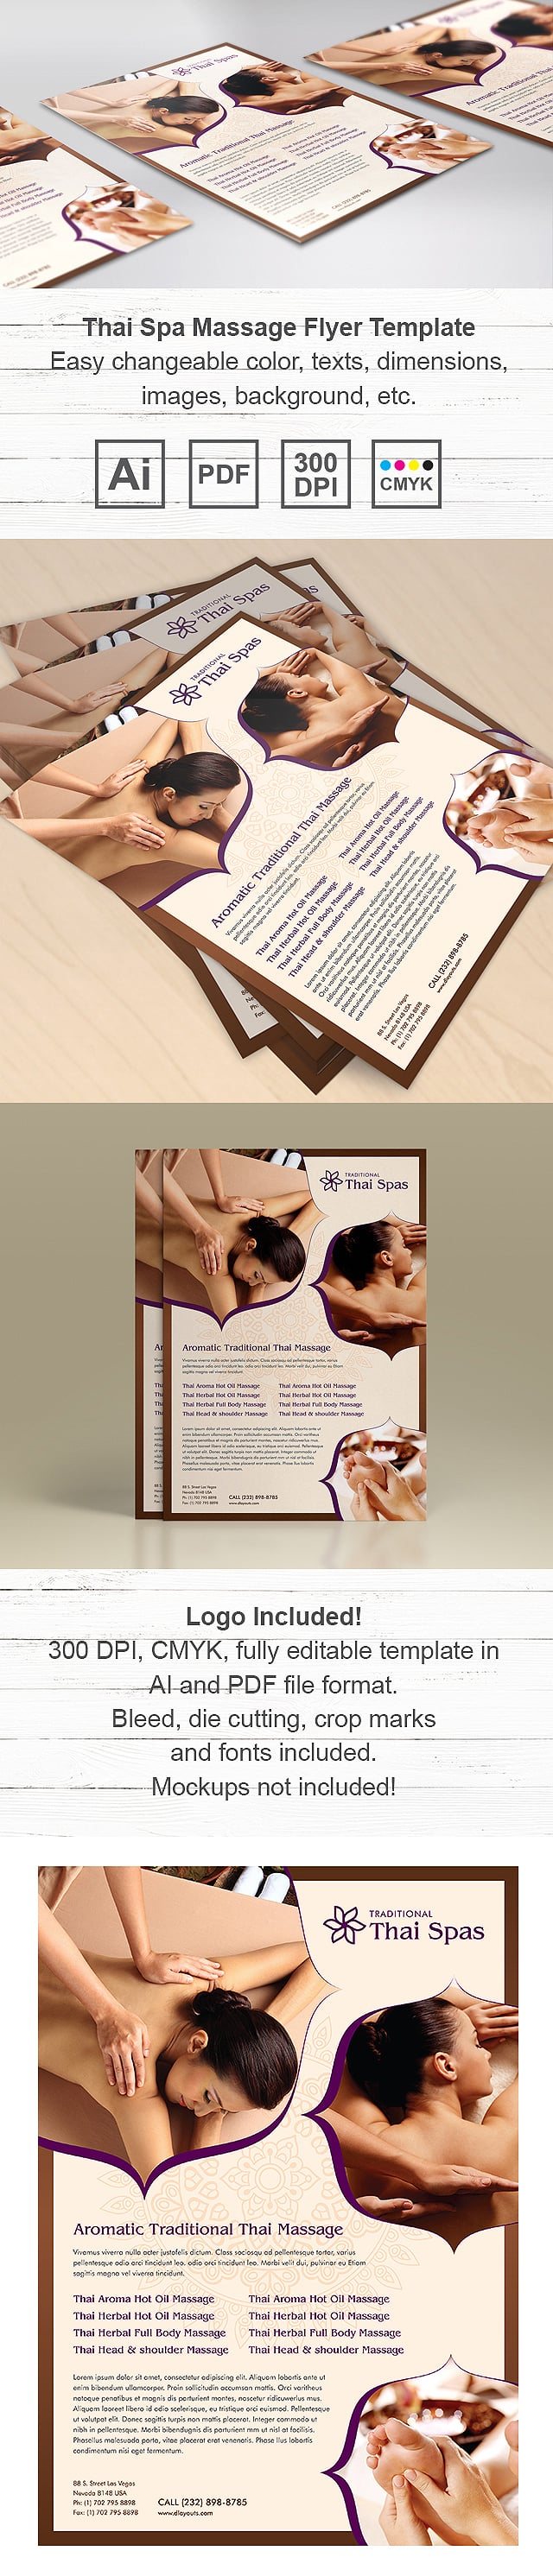 Thai Spa Massage Flyer Template